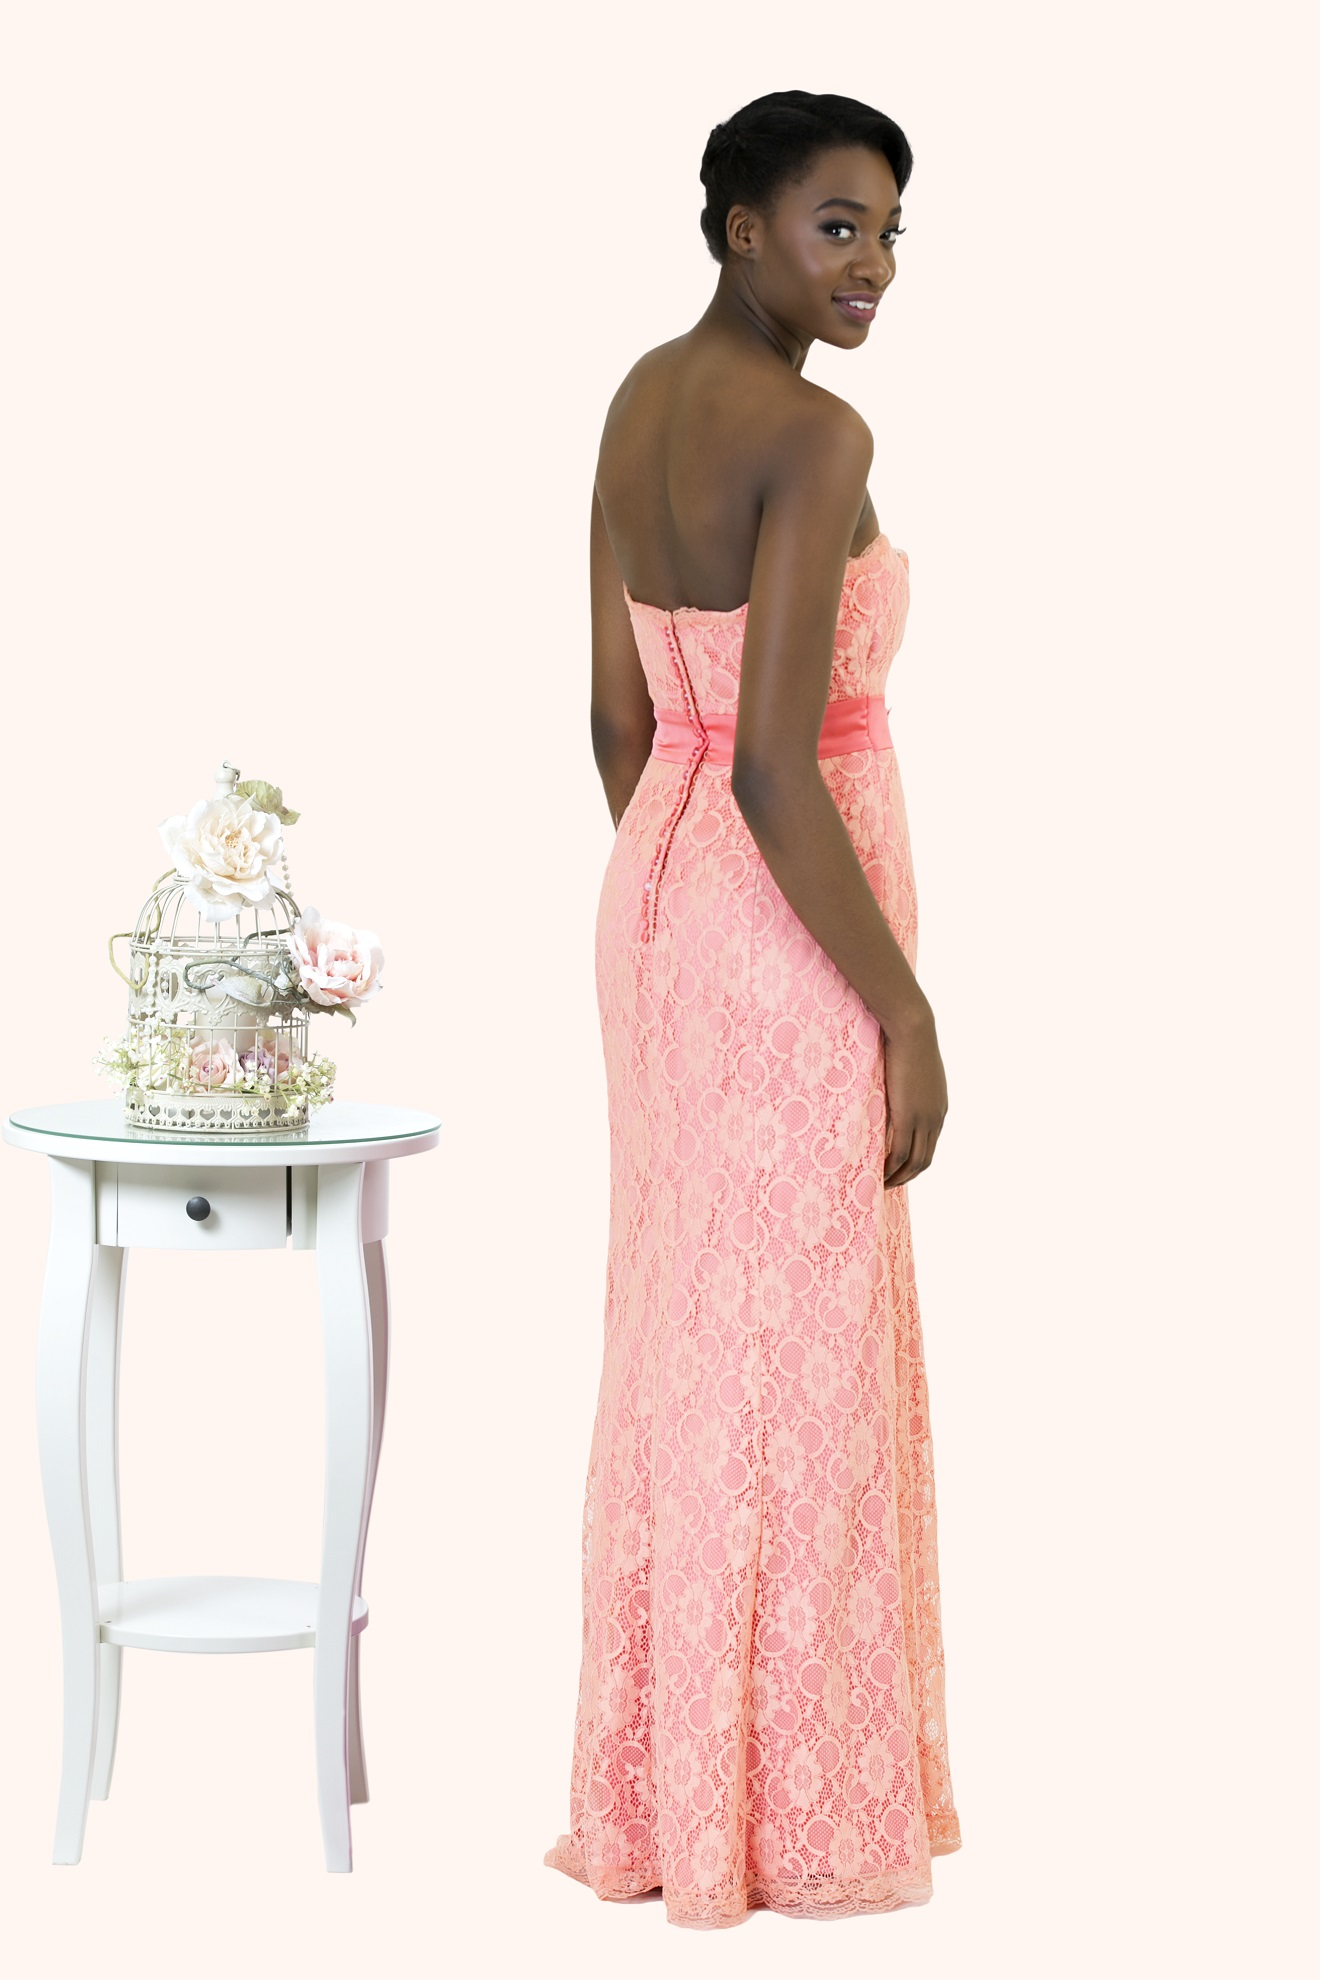 Lianne long lace mermaid bridesmaid dress lianne strapless full lace mermaid prom dress back view estilo moda bridal prom dresses milton ombrellifo Images